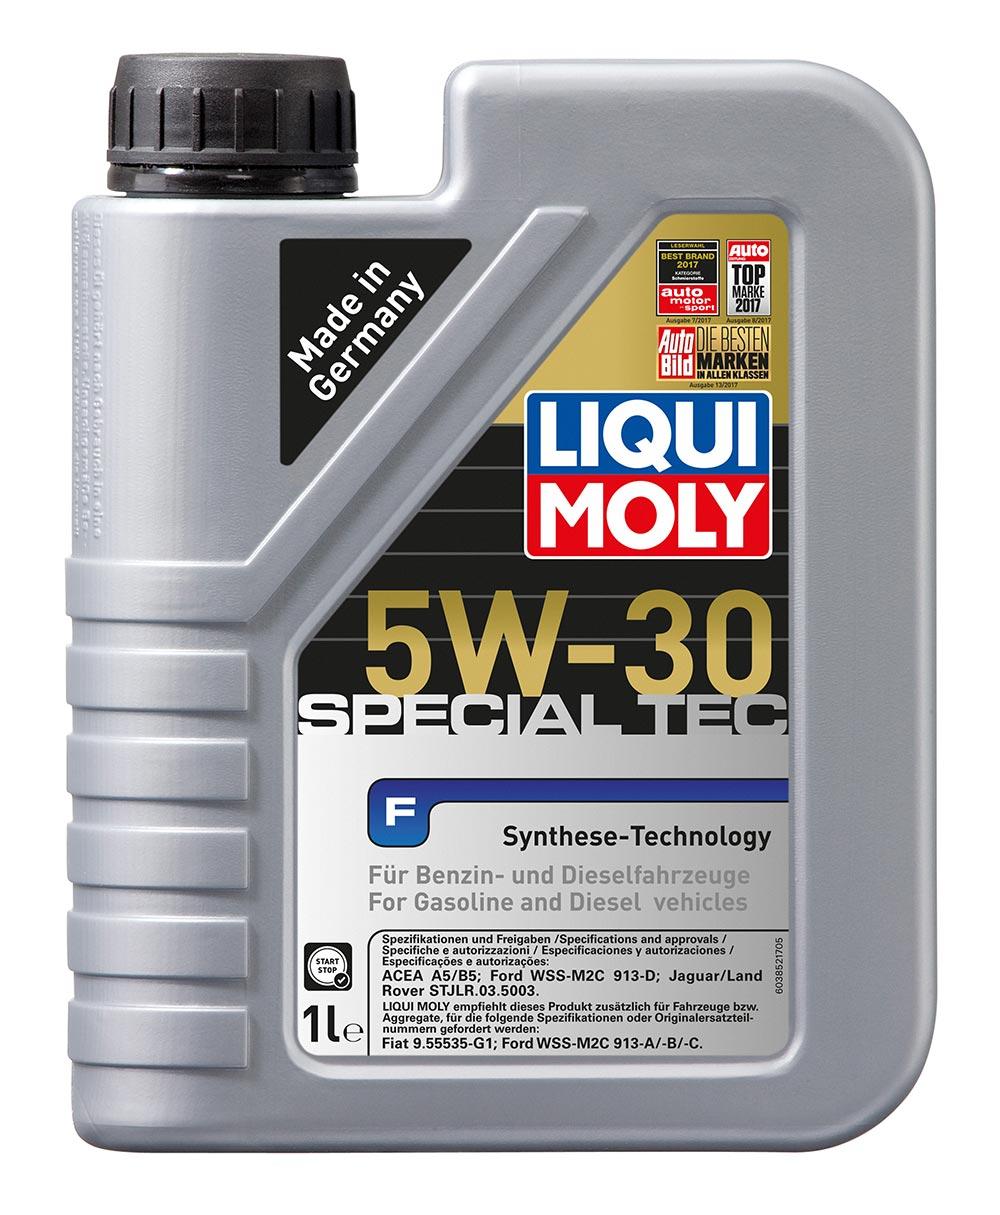 Масло моторное синт. 5W30 Special Tec F 1л ACEA A5/B5. Ford WSS-M2C 913-A/B/C